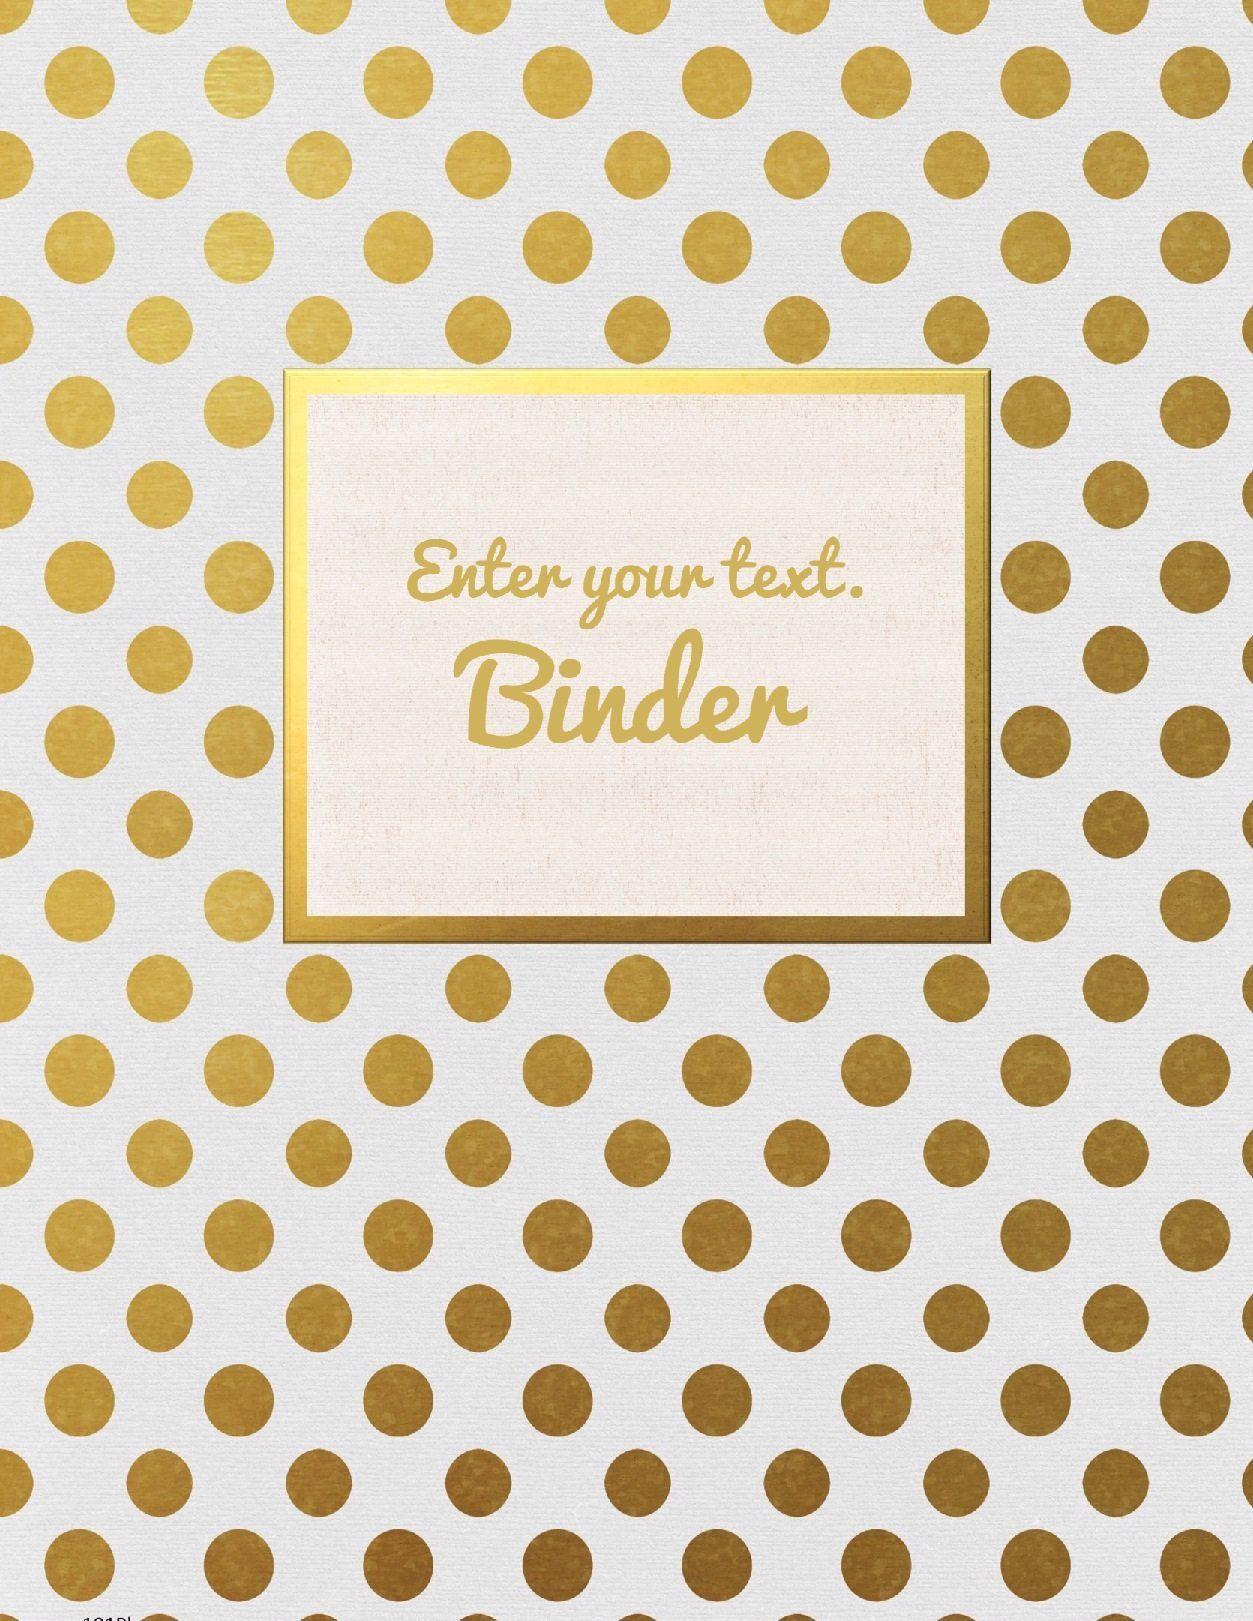 Free Binder Cover Templates   Art And Design   Pinterest   Binder - Free Printable Customizable Binder Covers